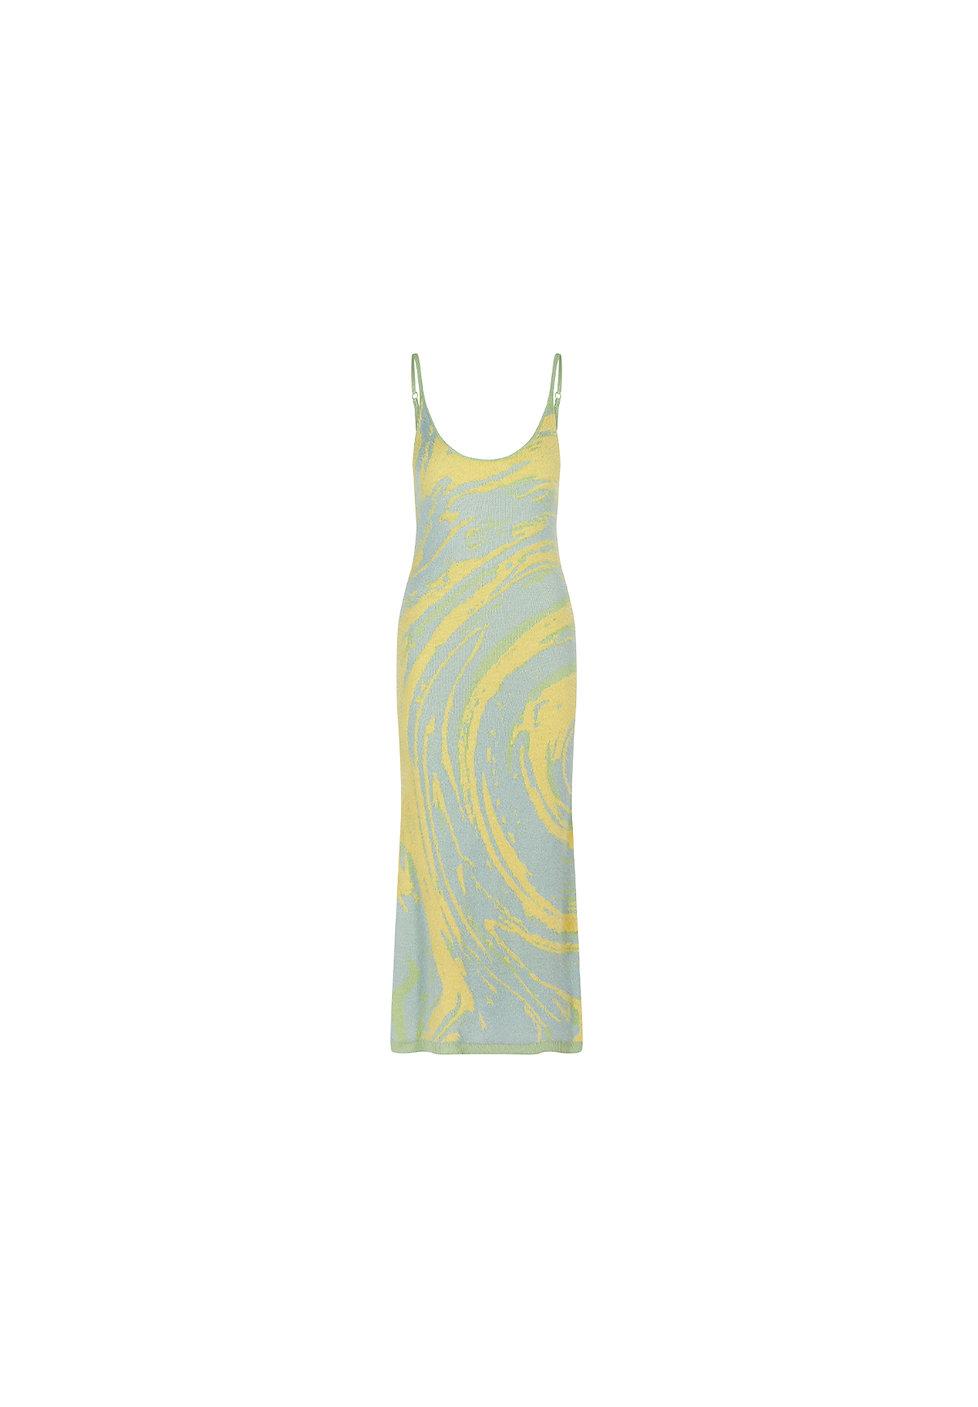 VOL18124 Long Knit Dress with Green Galaxy Print A.jpg